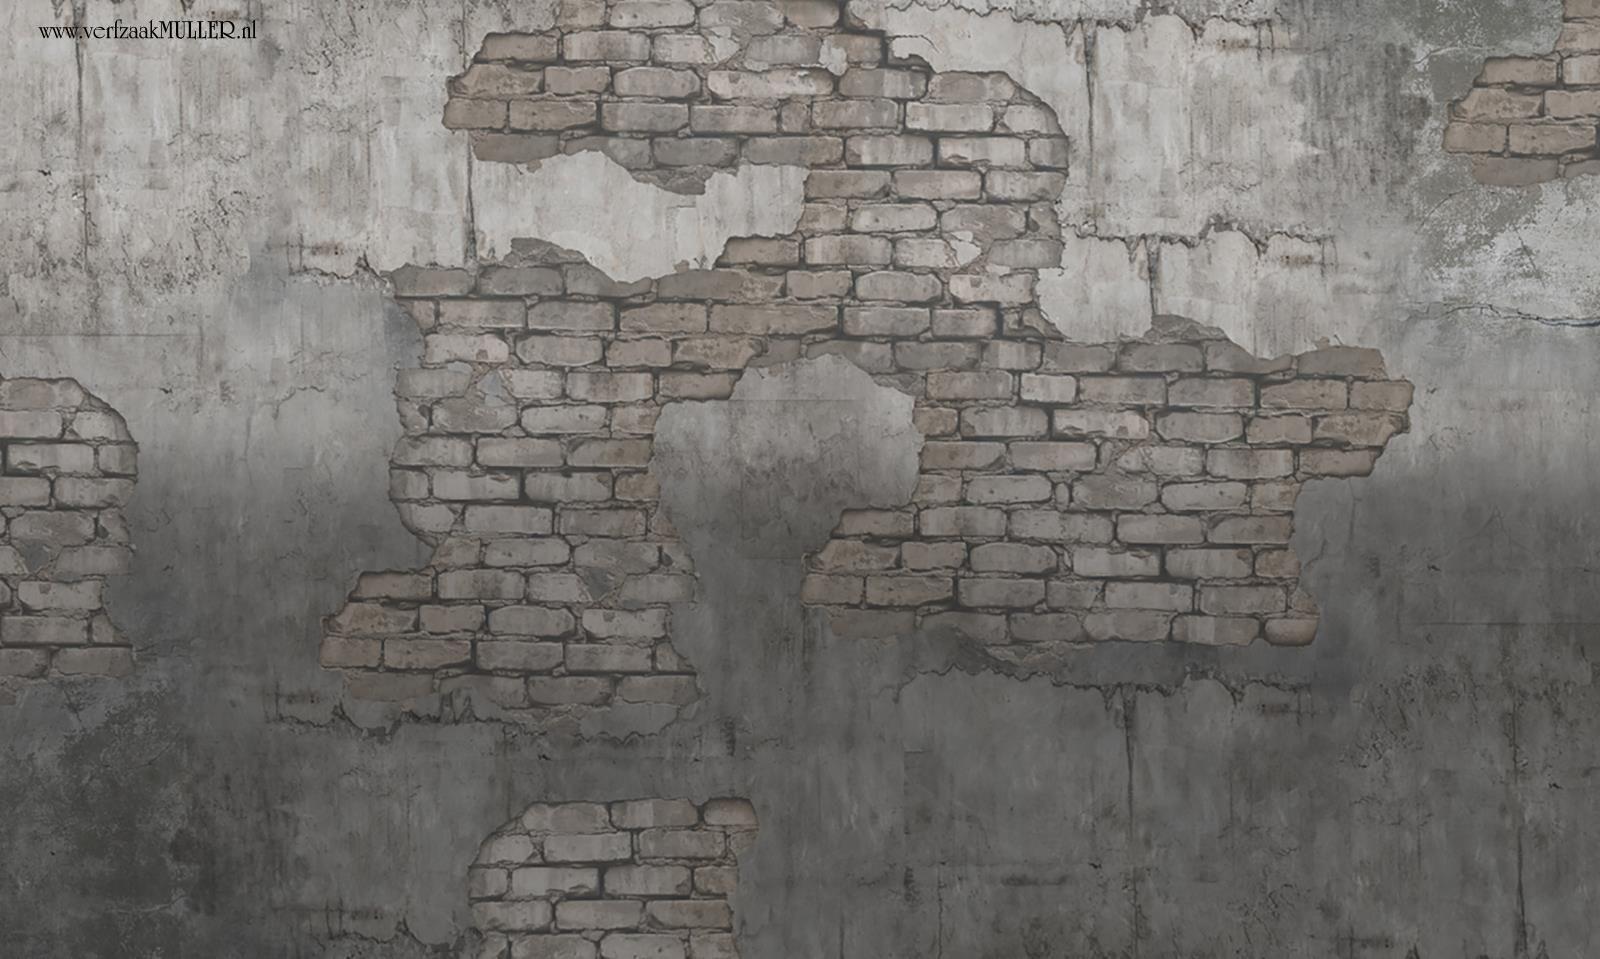 Wallpaper Behang Vanilla Lime Exposed Brick Wallpaper Brick Wallpaper Brick Wallpaper Mural